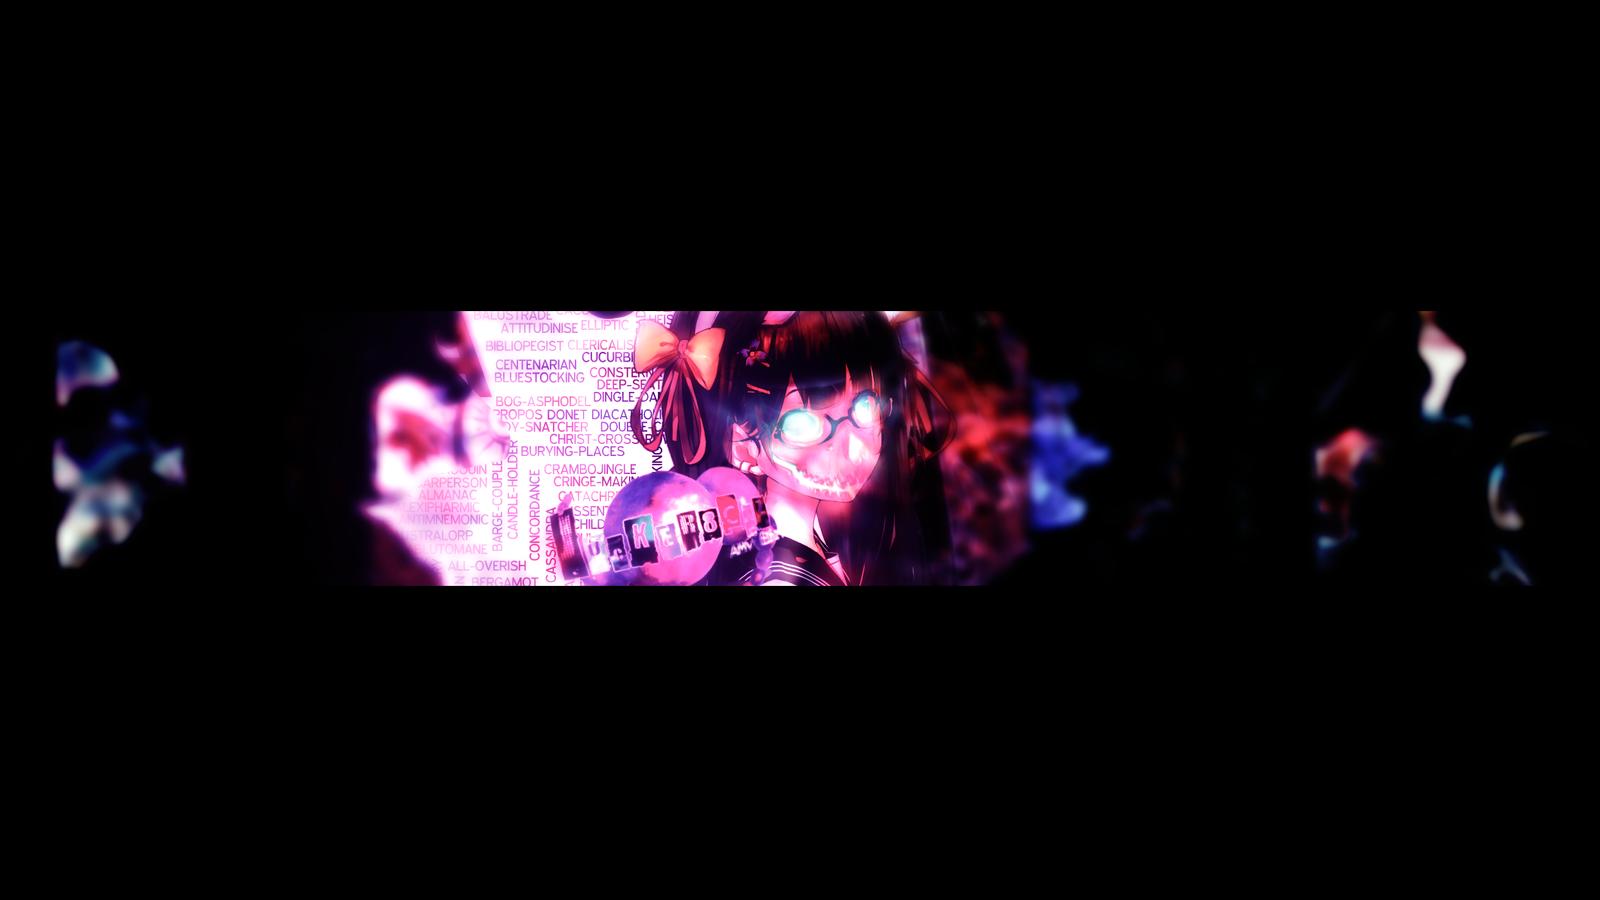 anime youtube banner by jocker8clz anime youtube banner by jocker8clz